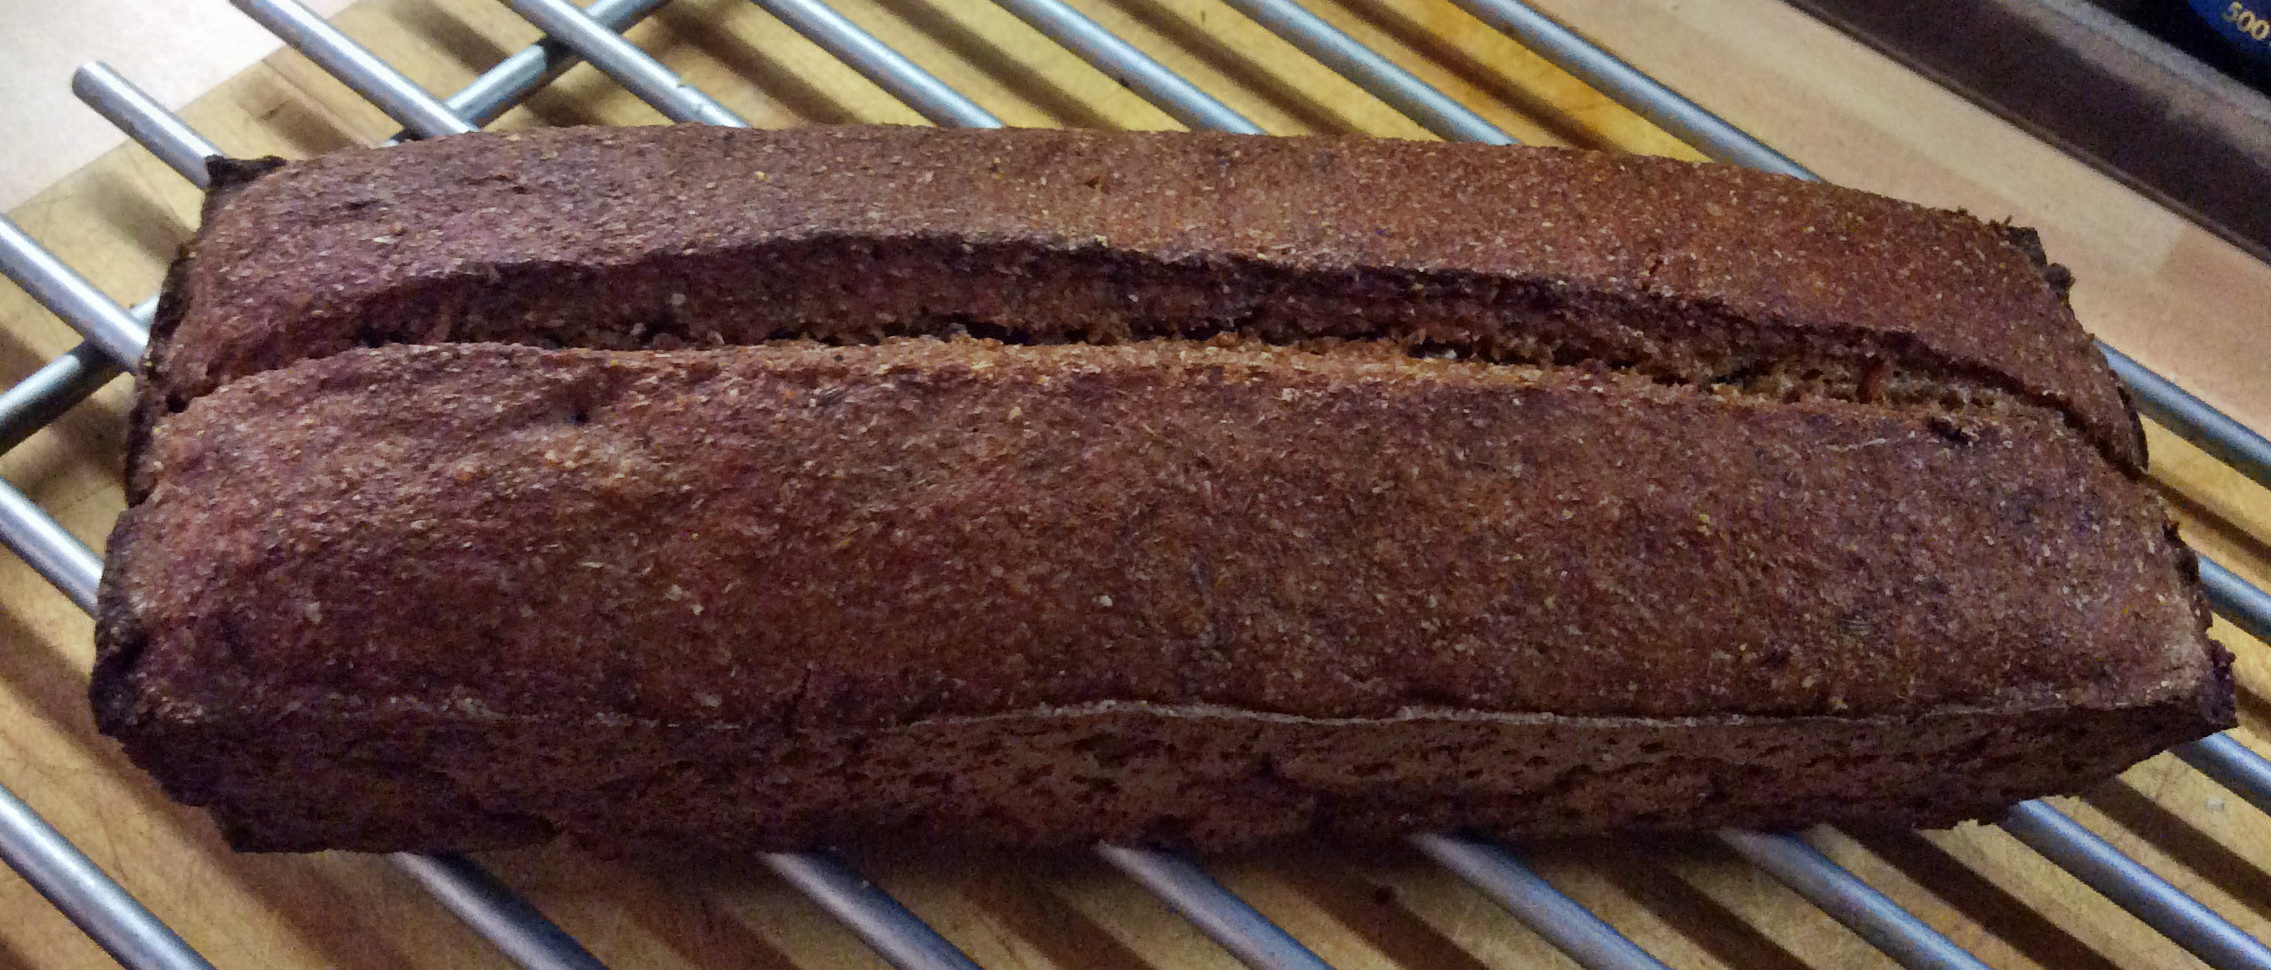 Brot -3-10-15   (3)